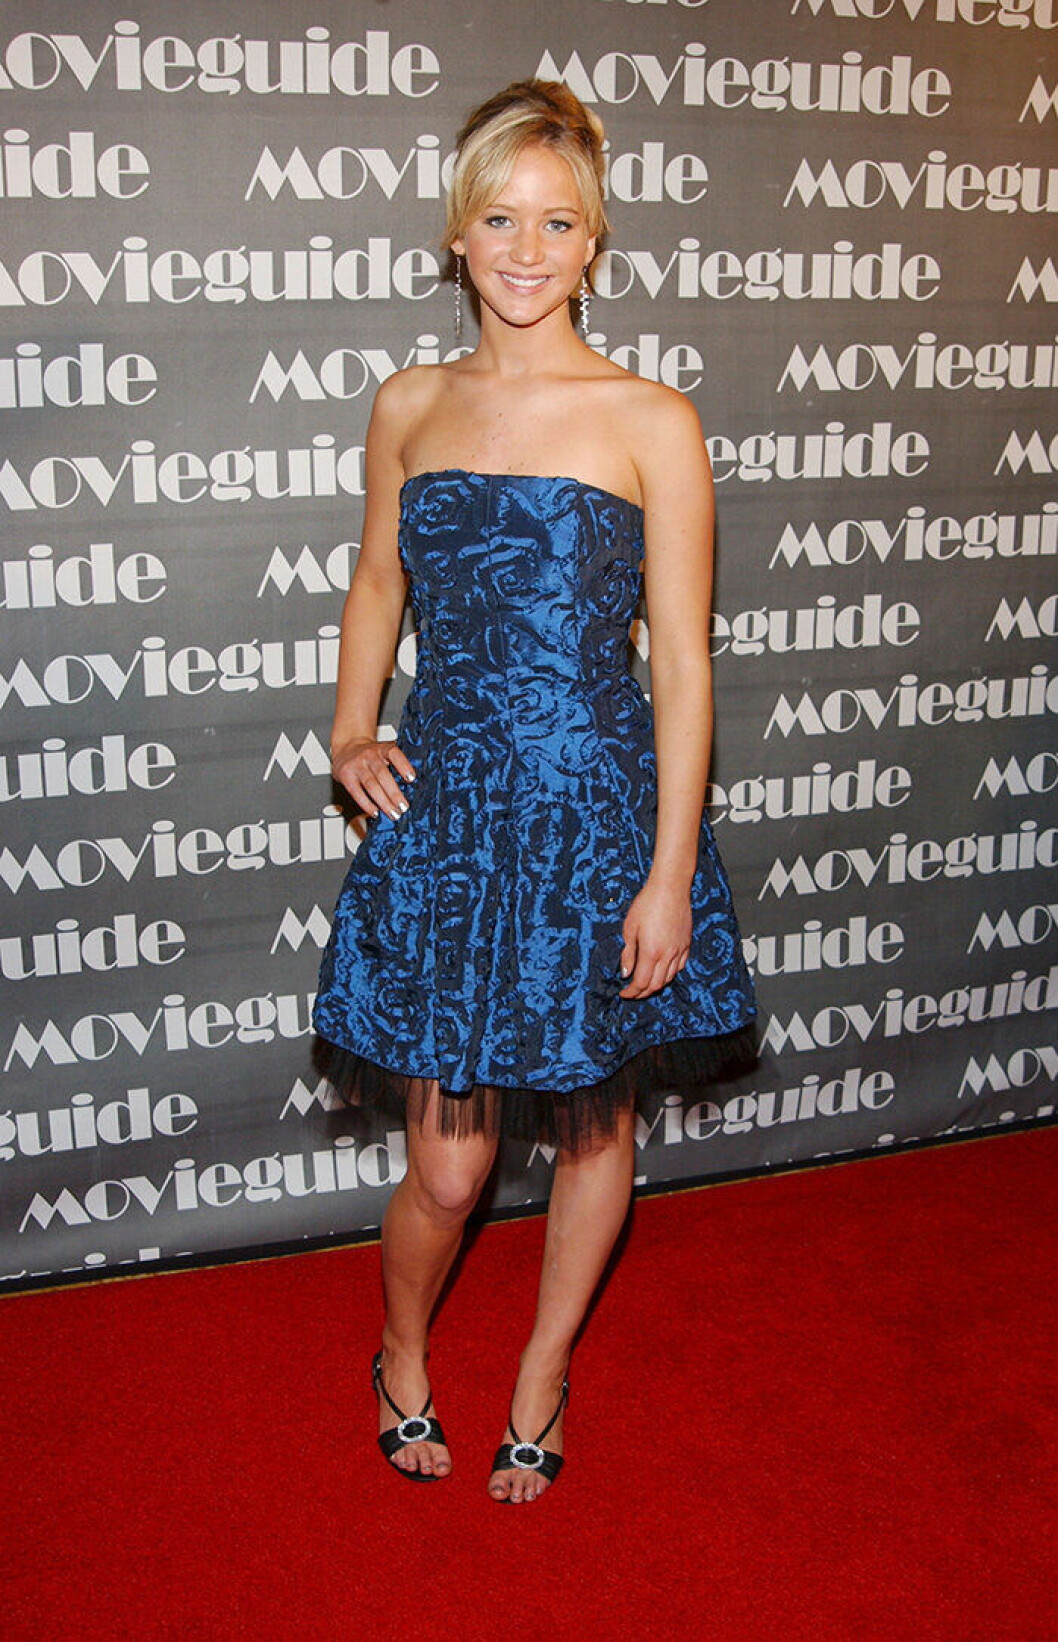 En bild på skådespelerskan Jennifer Lawrence 2007